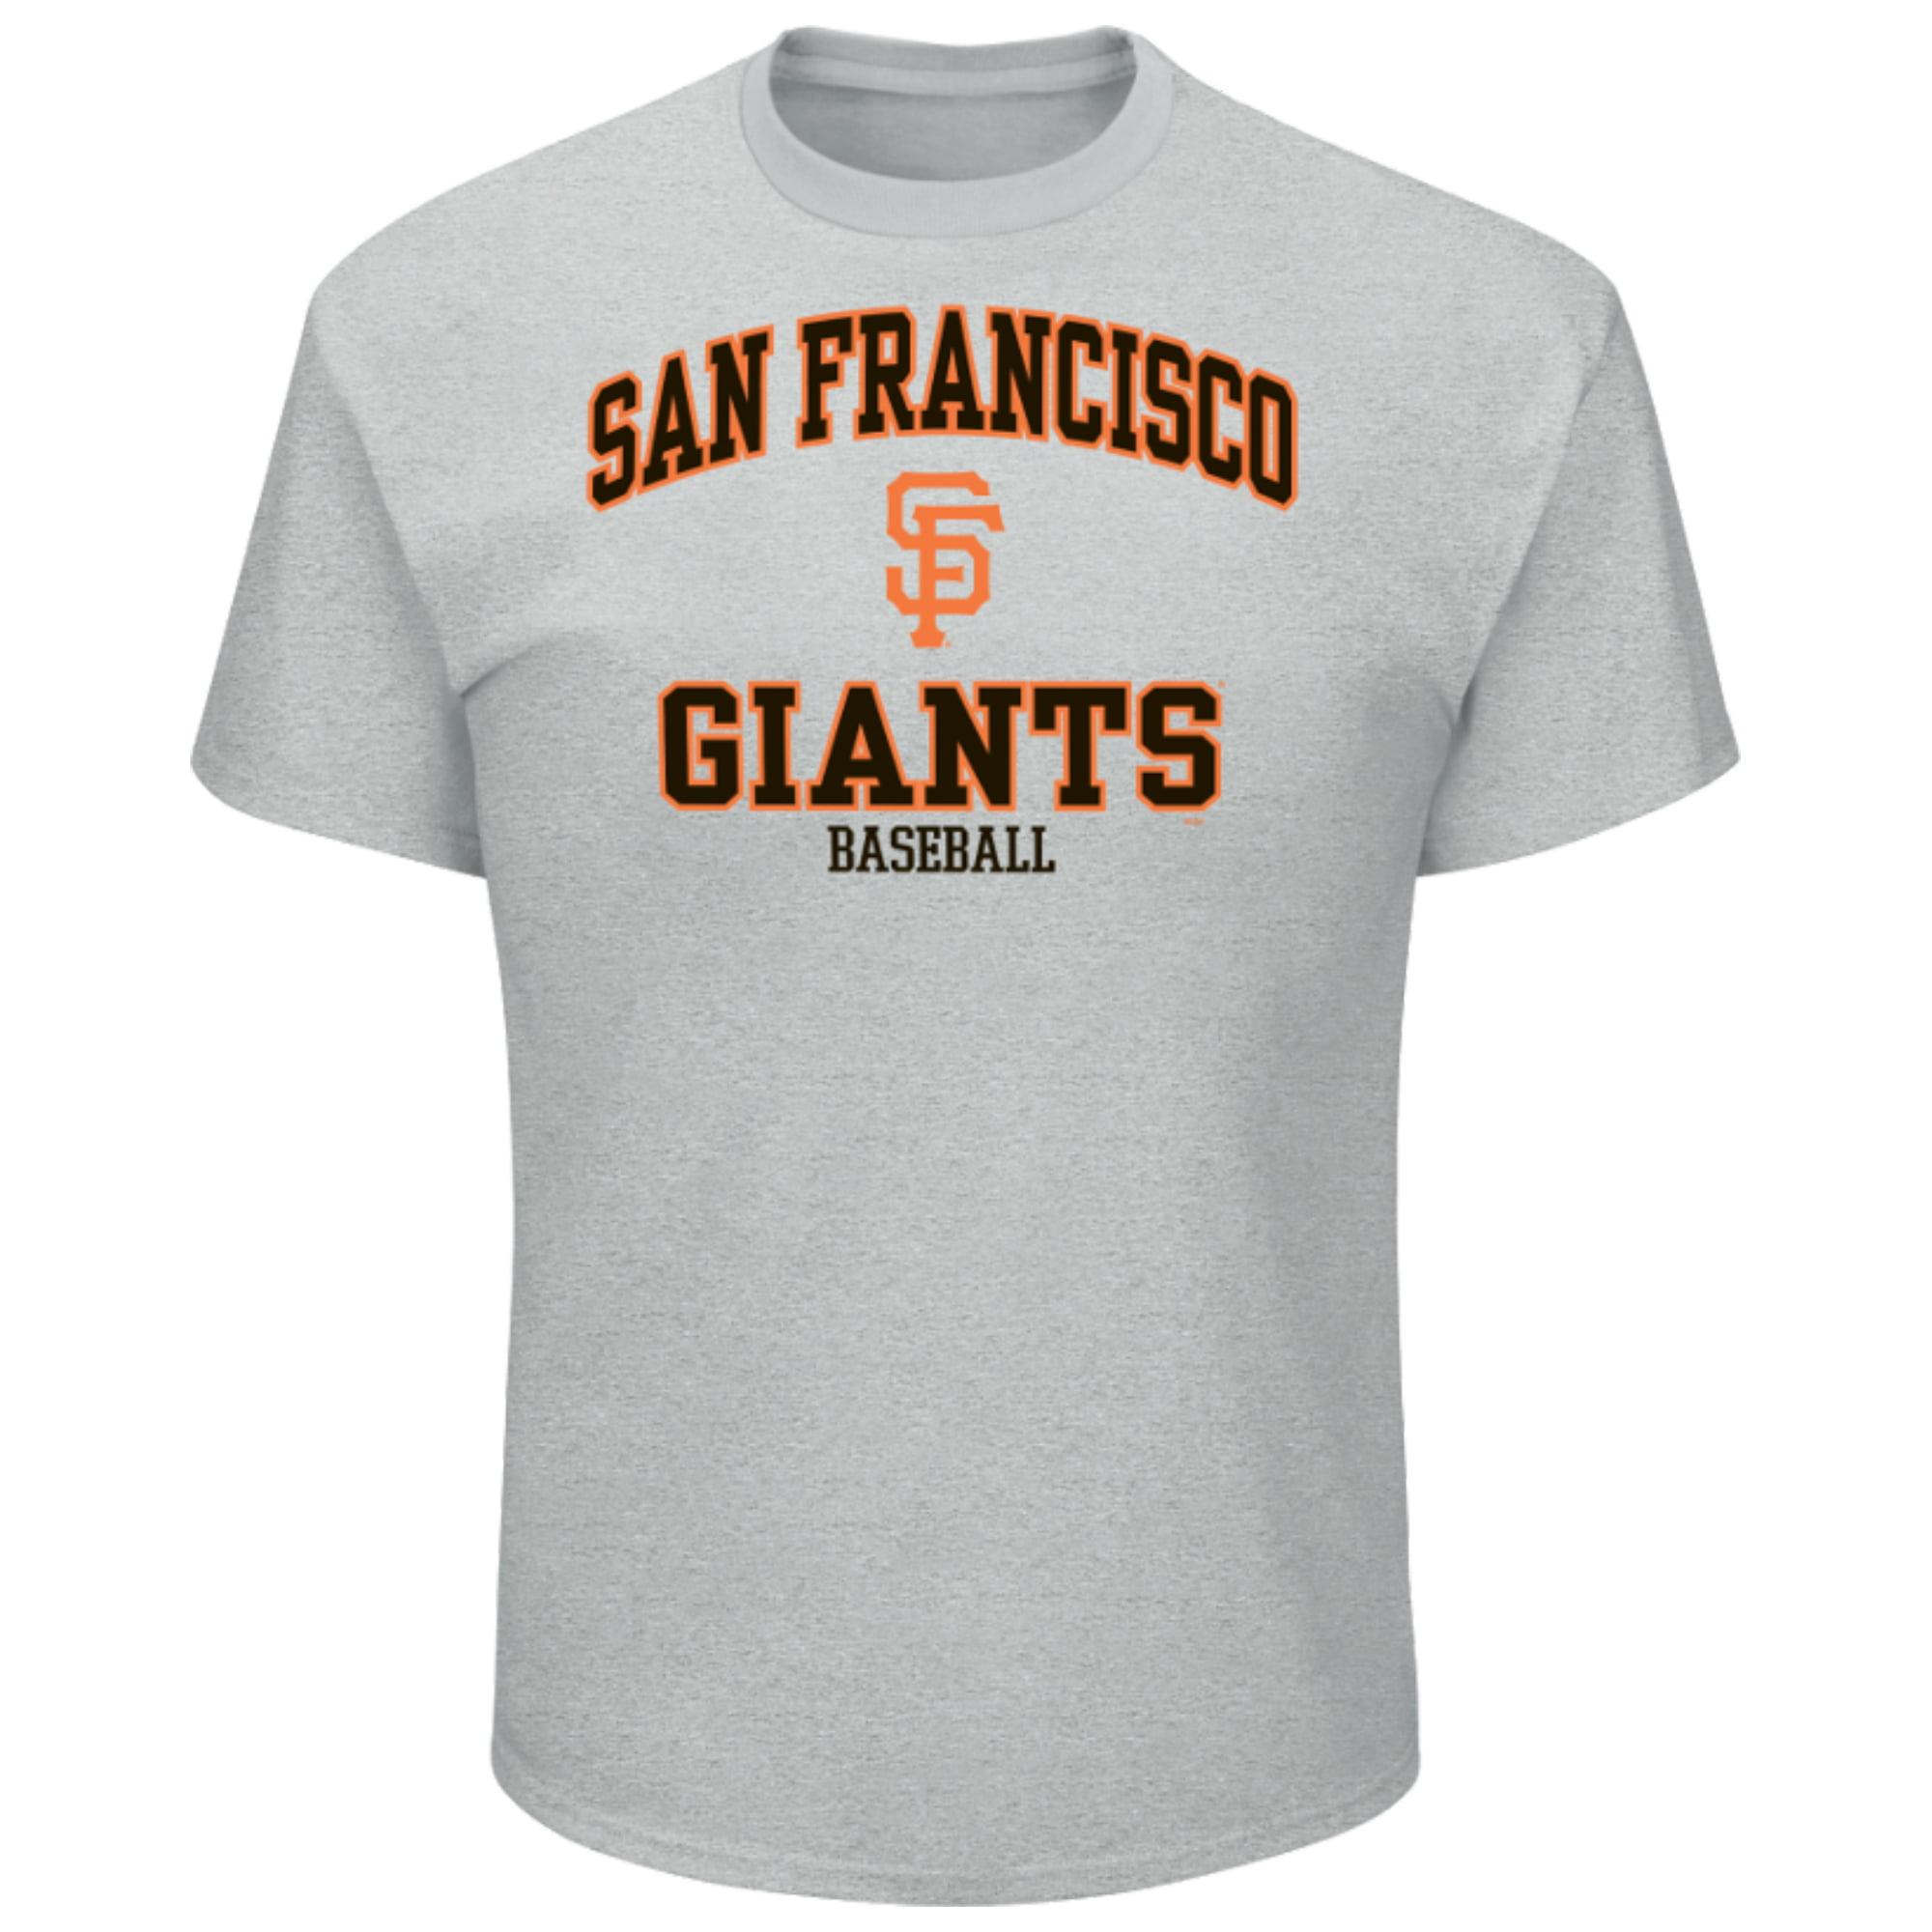 Men's Majestic Heathered Gray San Francisco Giants High Praise Team T-Shirt